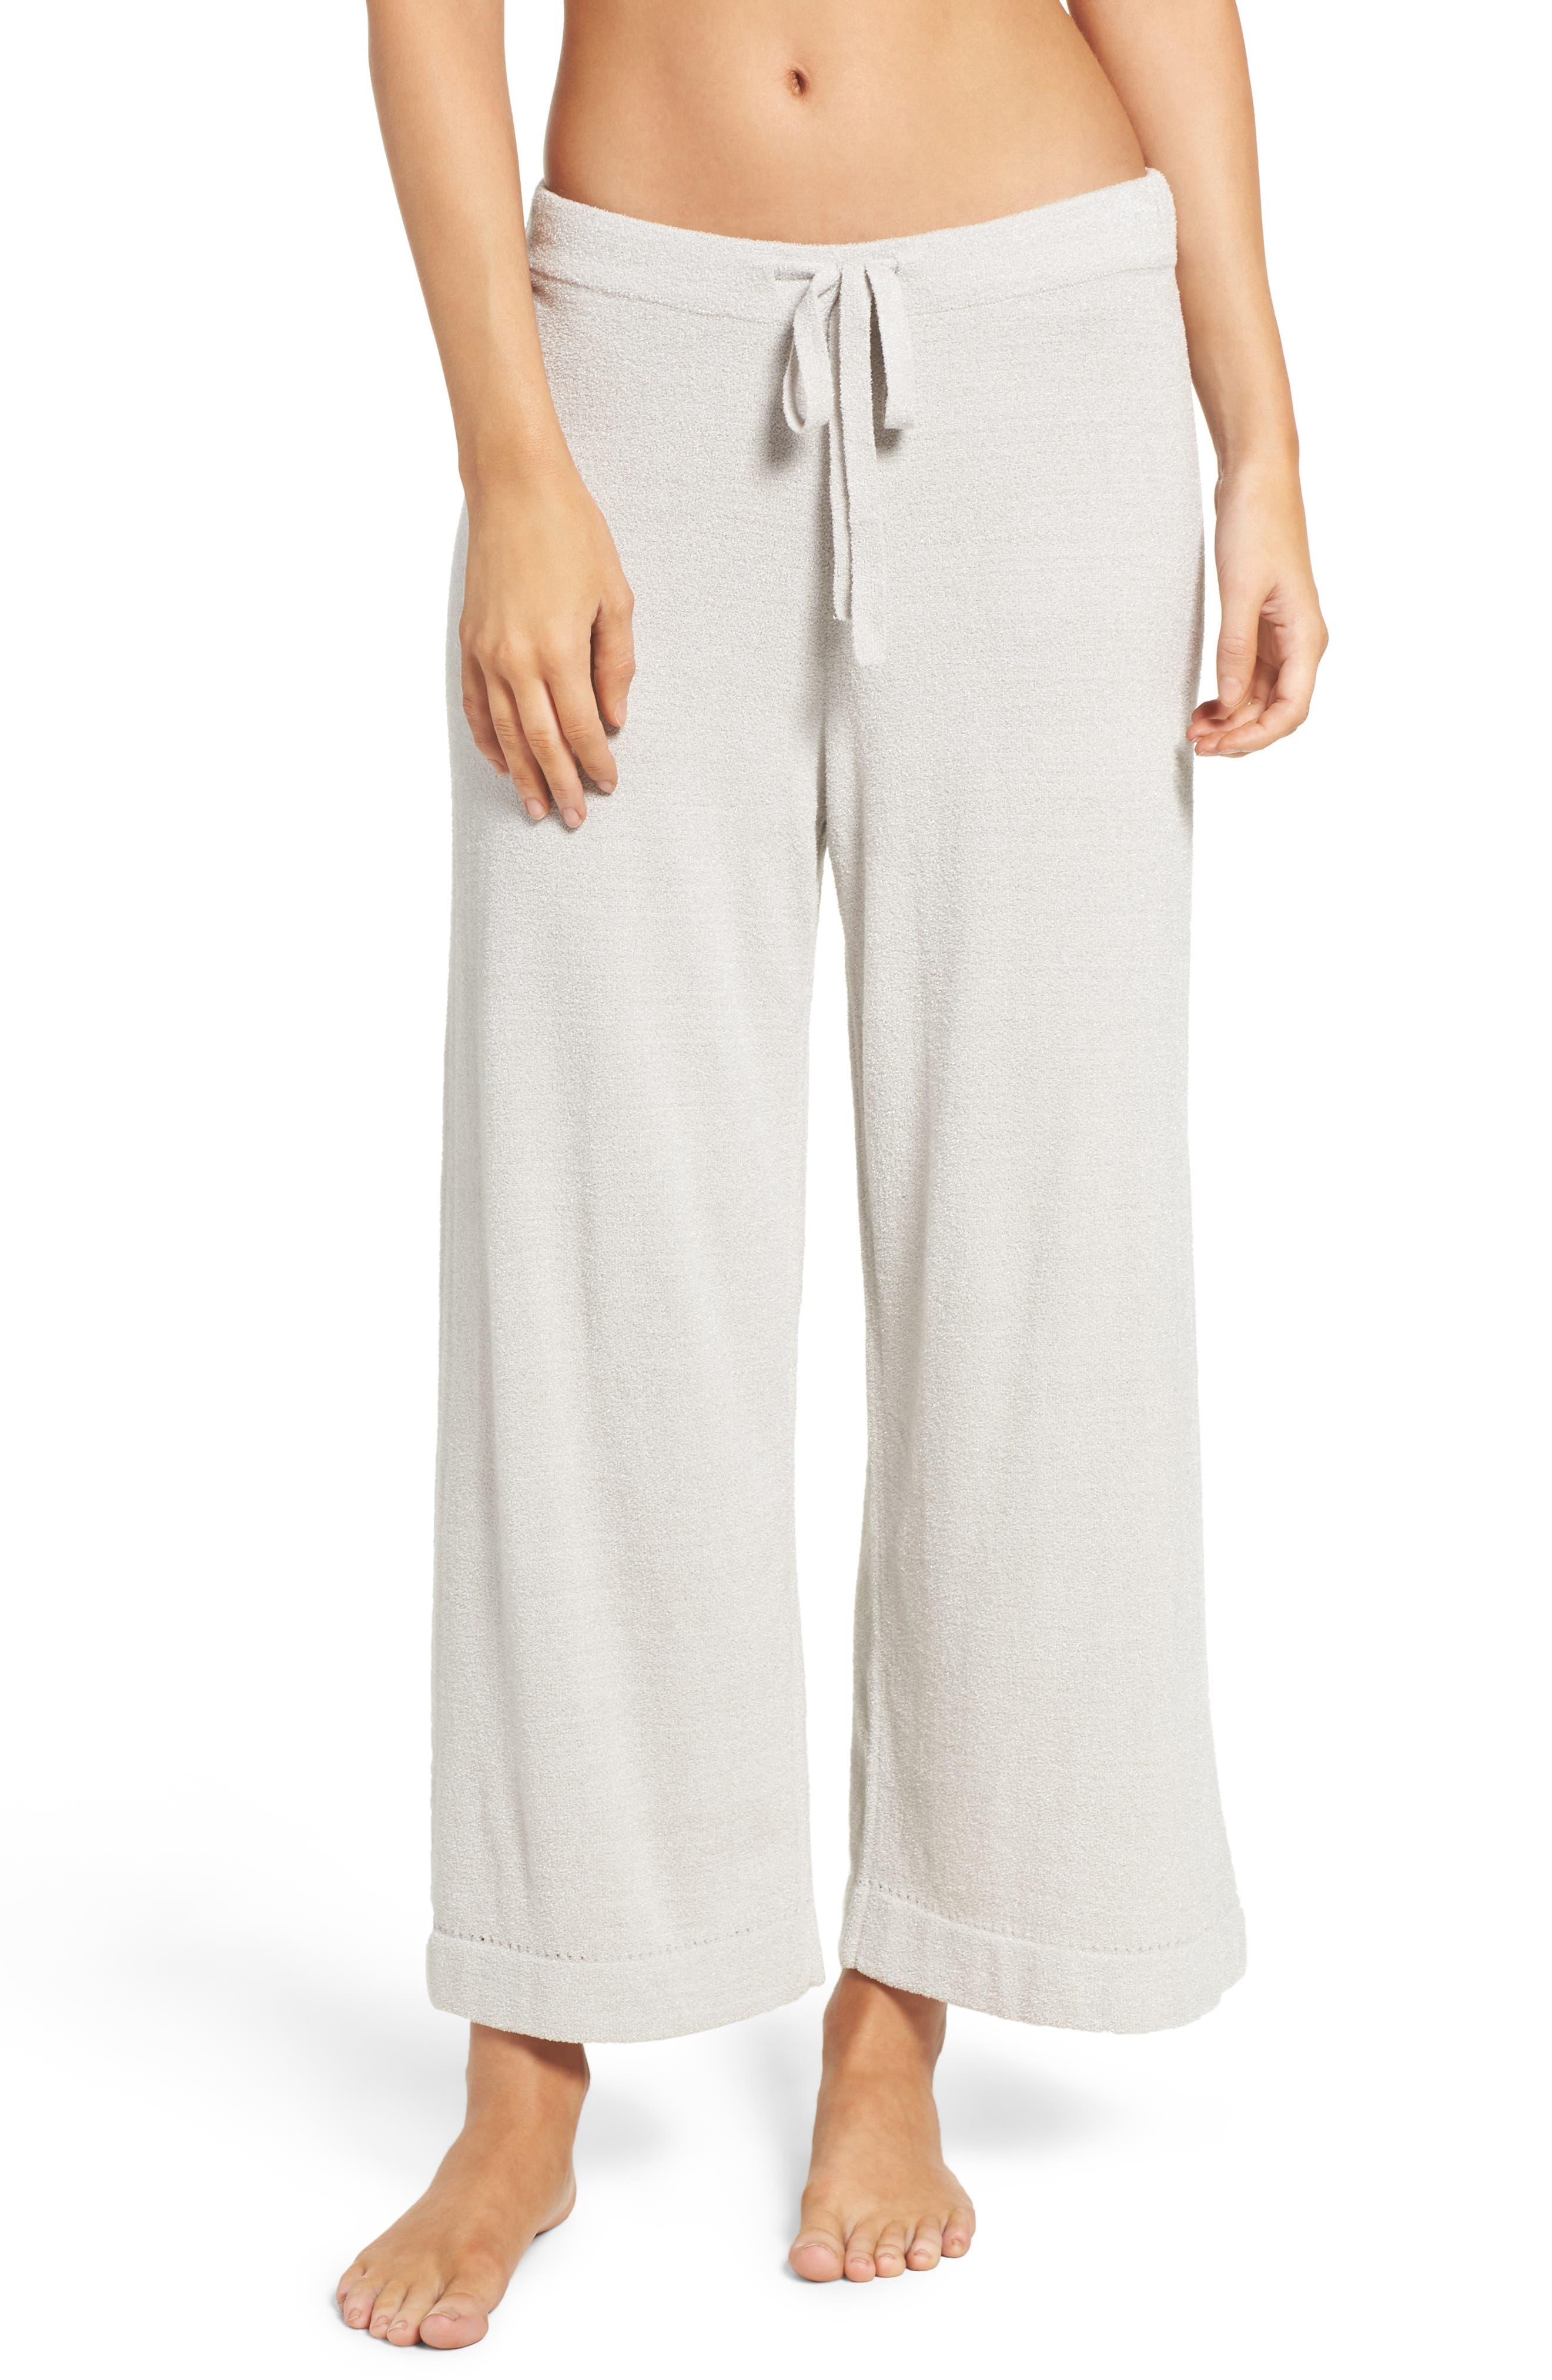 Main Image - Barefoot Dreams® Cozychic Ultra Lite® Culotte Lounge Pants